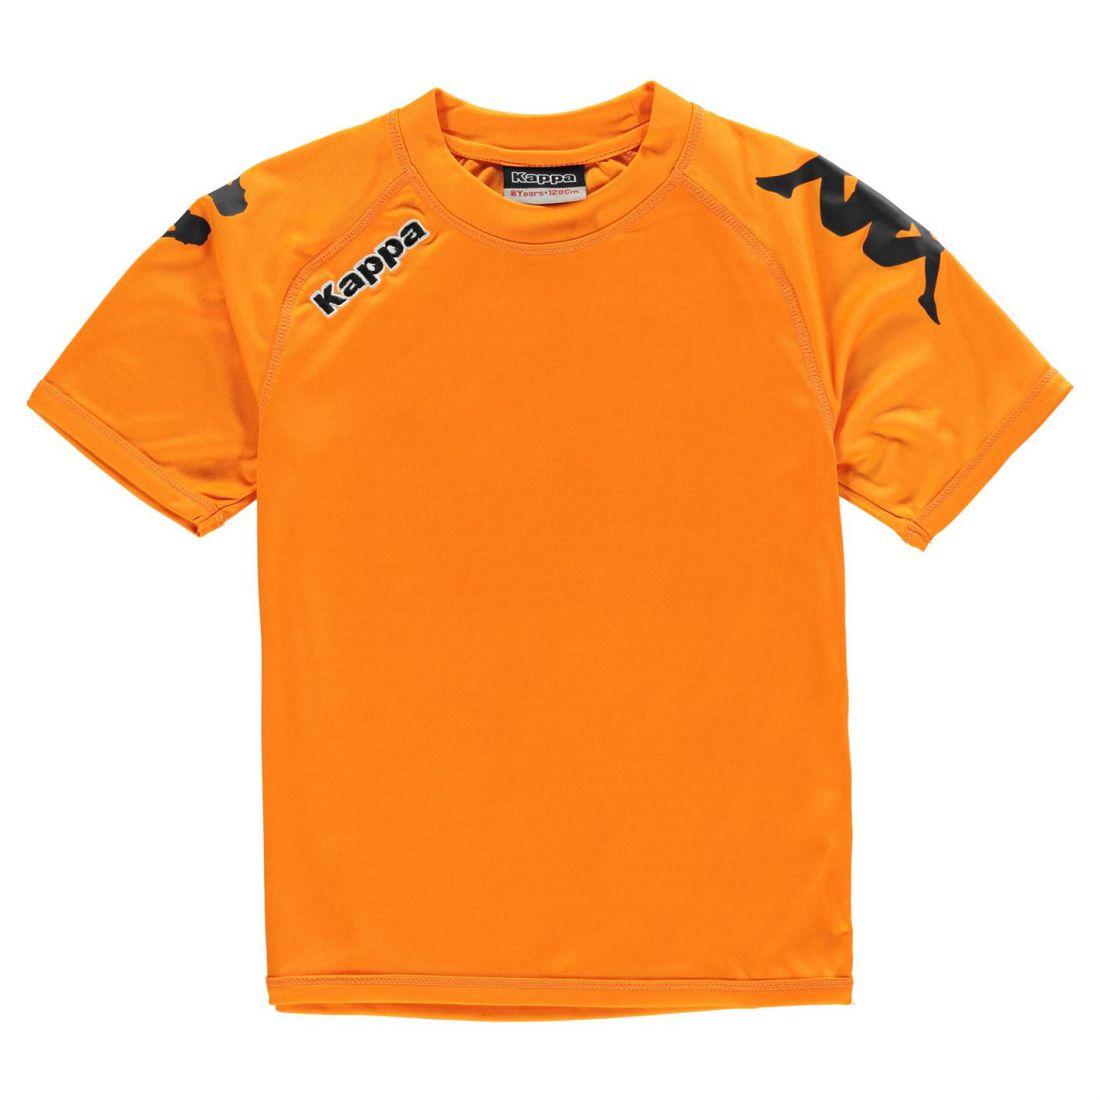 9f948b0e Kappa Kids Boys Veneto T Shirt Junior Performance Vest Tee Top Tank ...